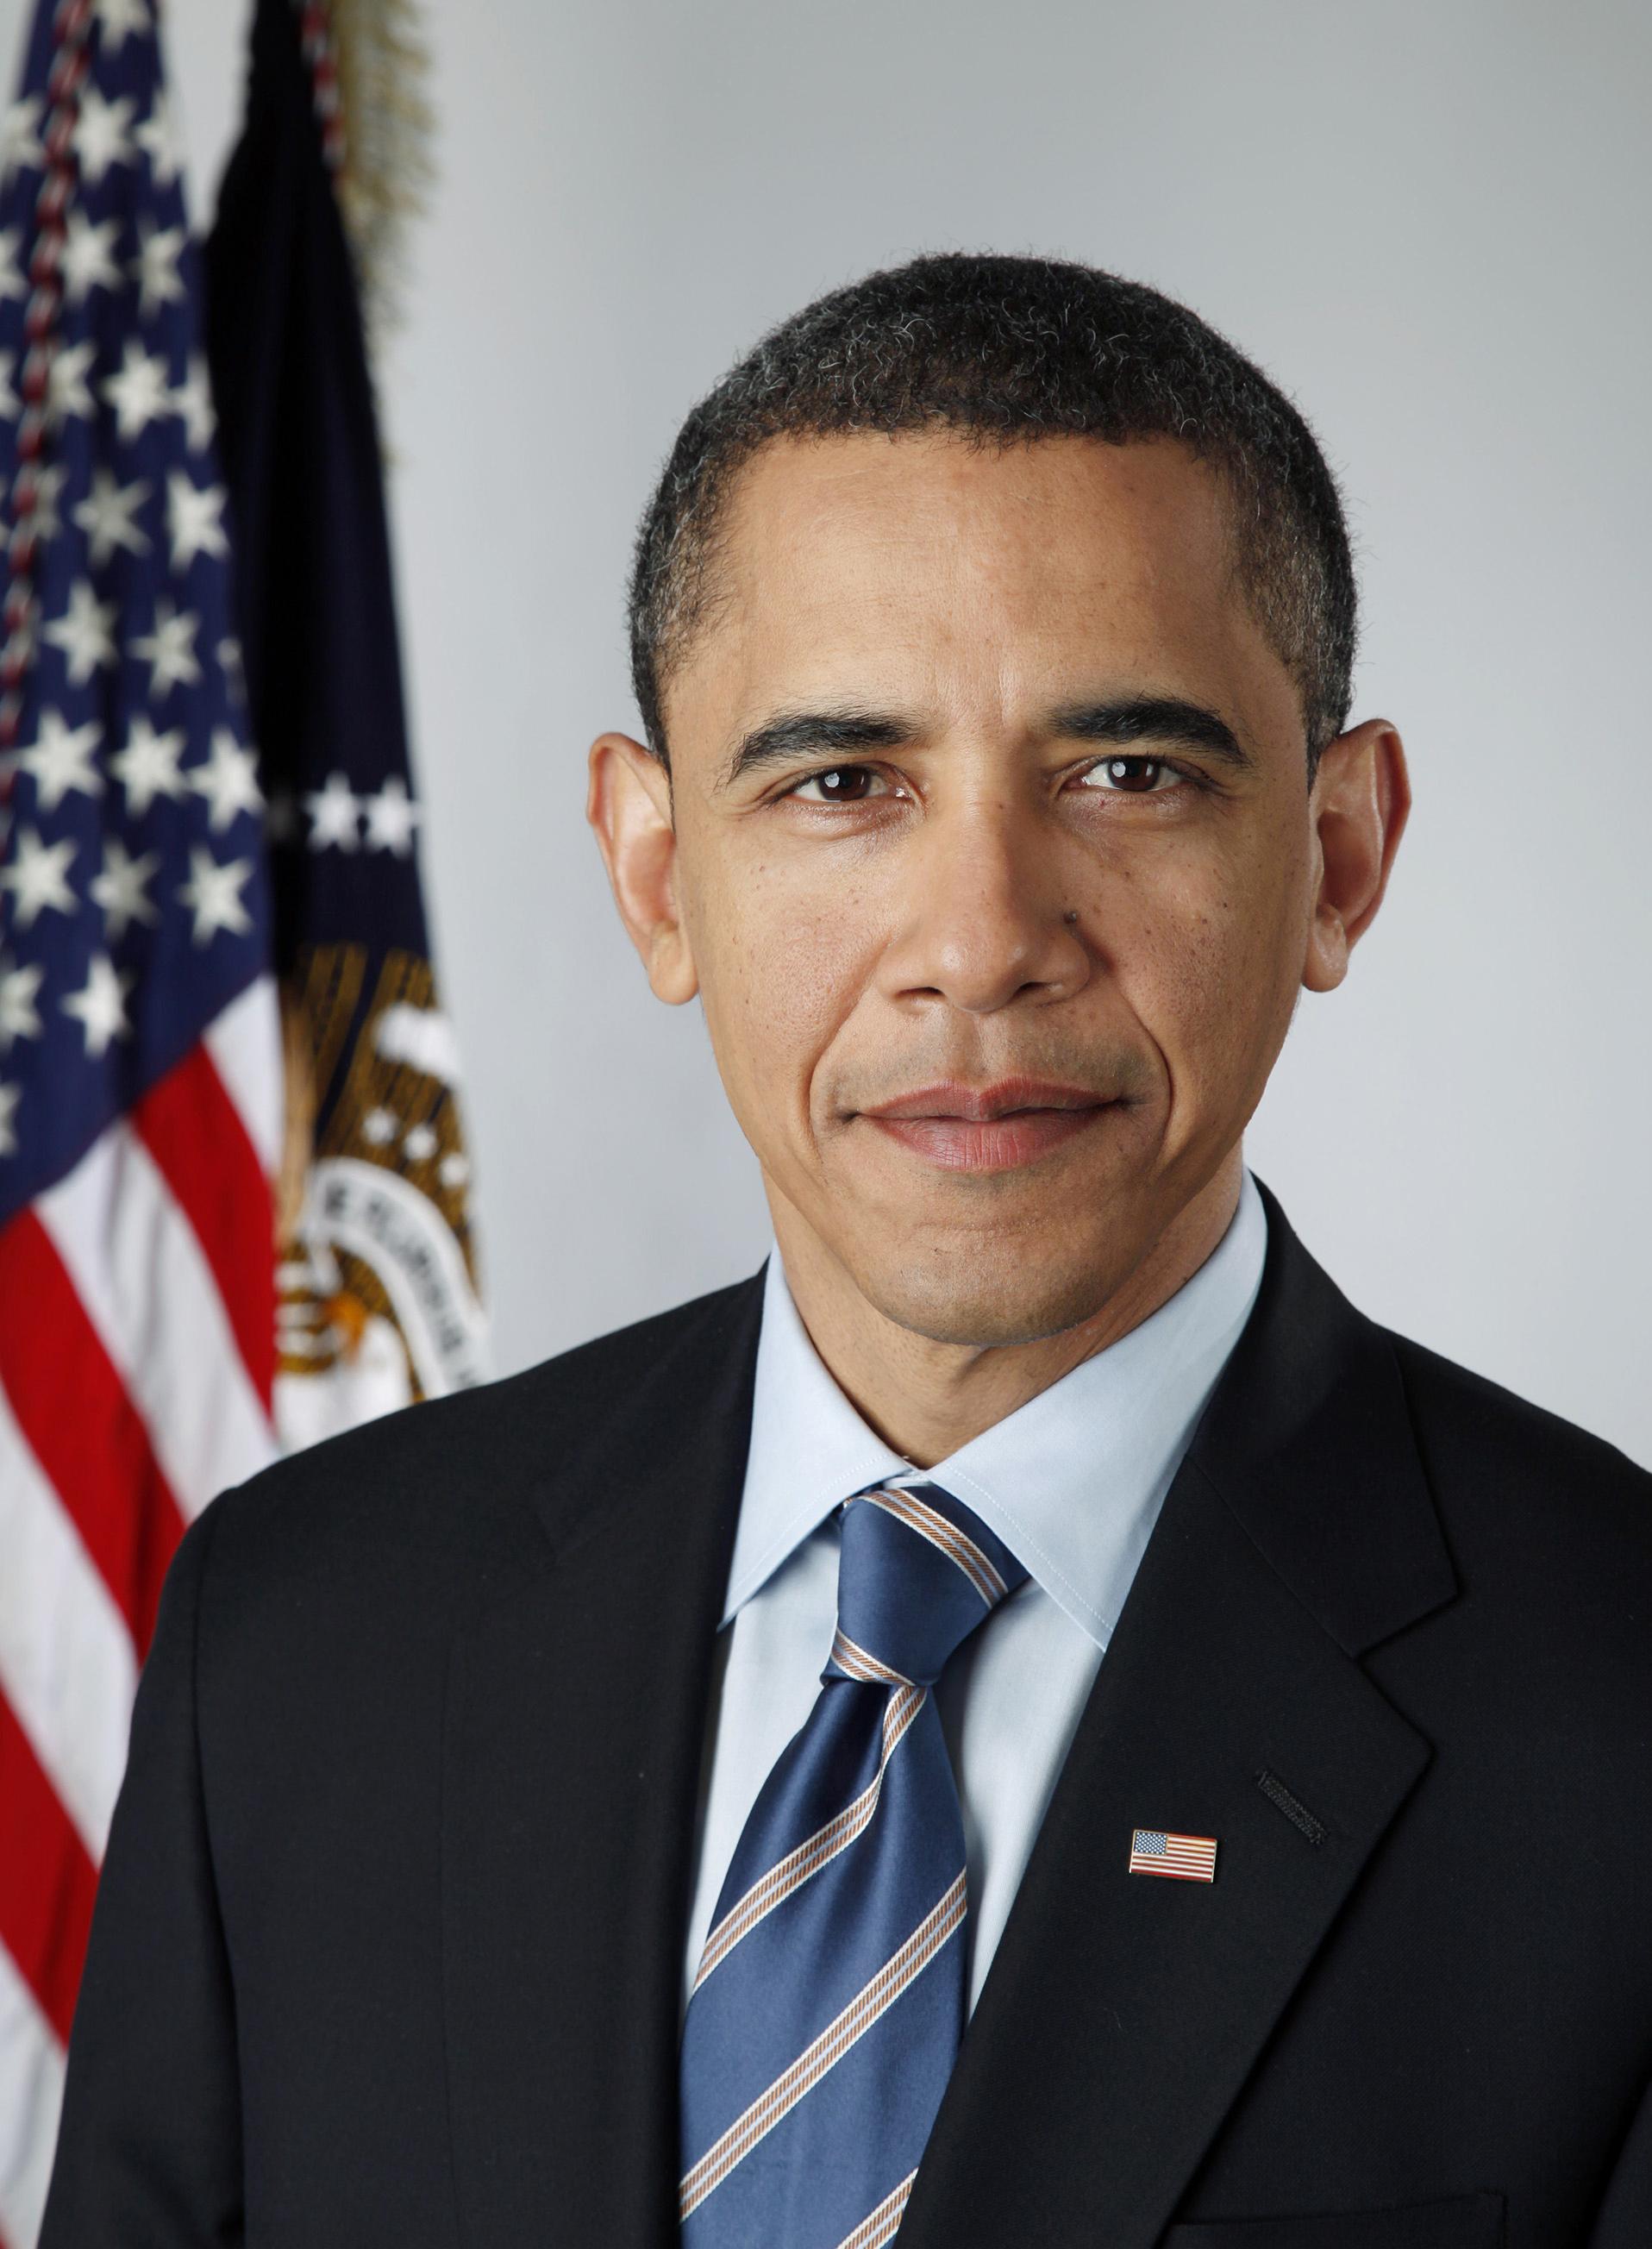 Obama 0 - Copy (2) - Copy.jpg